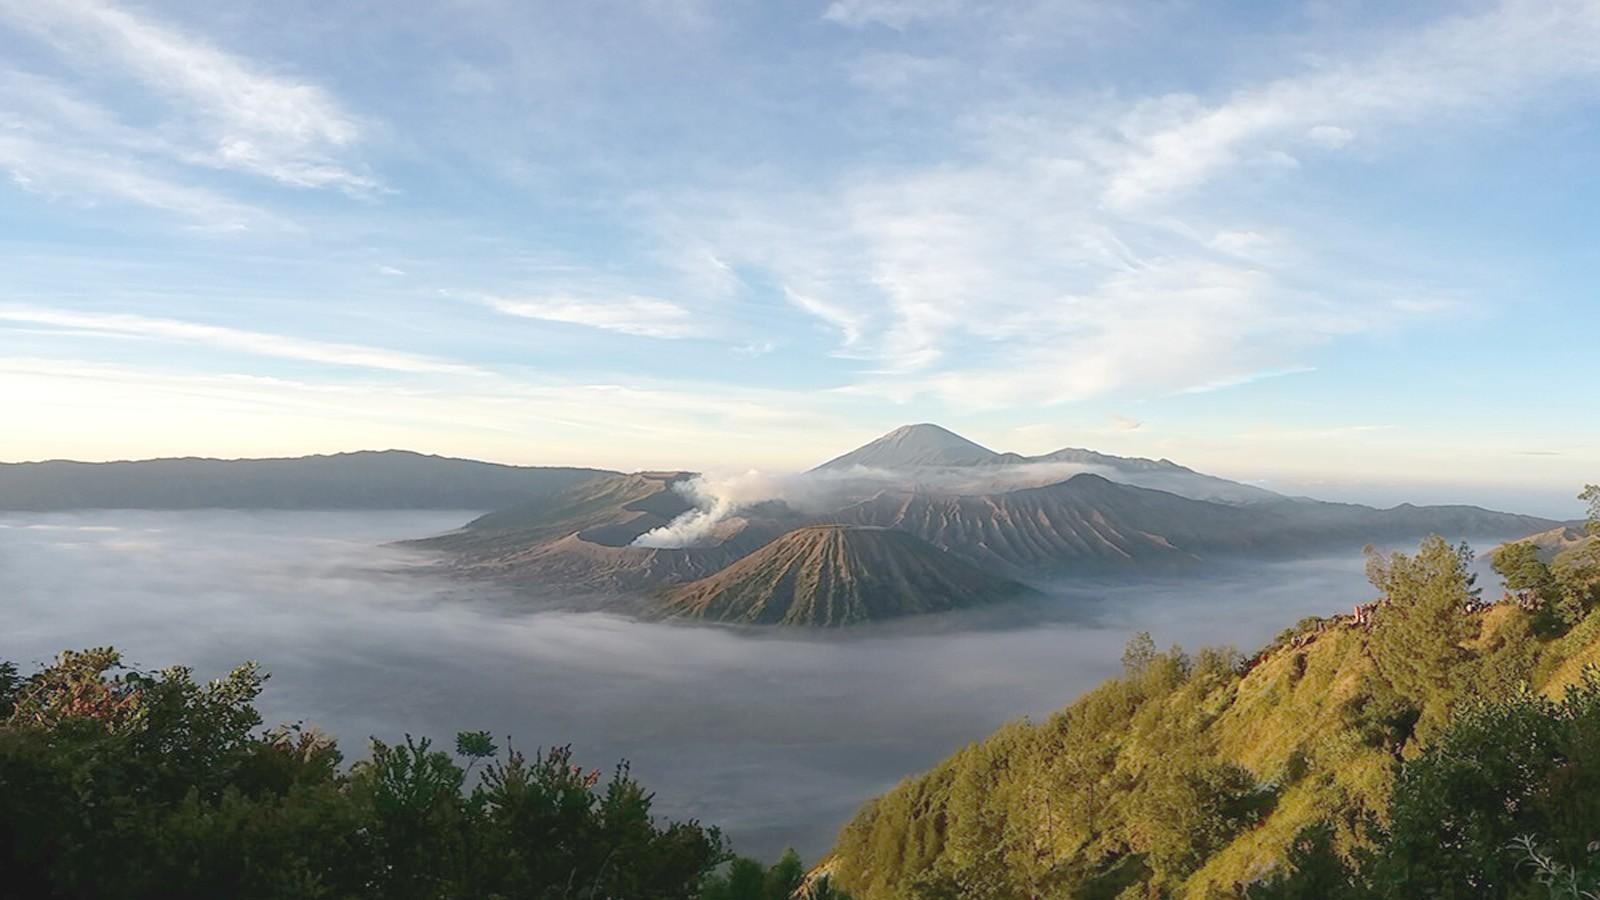 Bromo Ijen East Java Tour Package 4 days from Surabaya